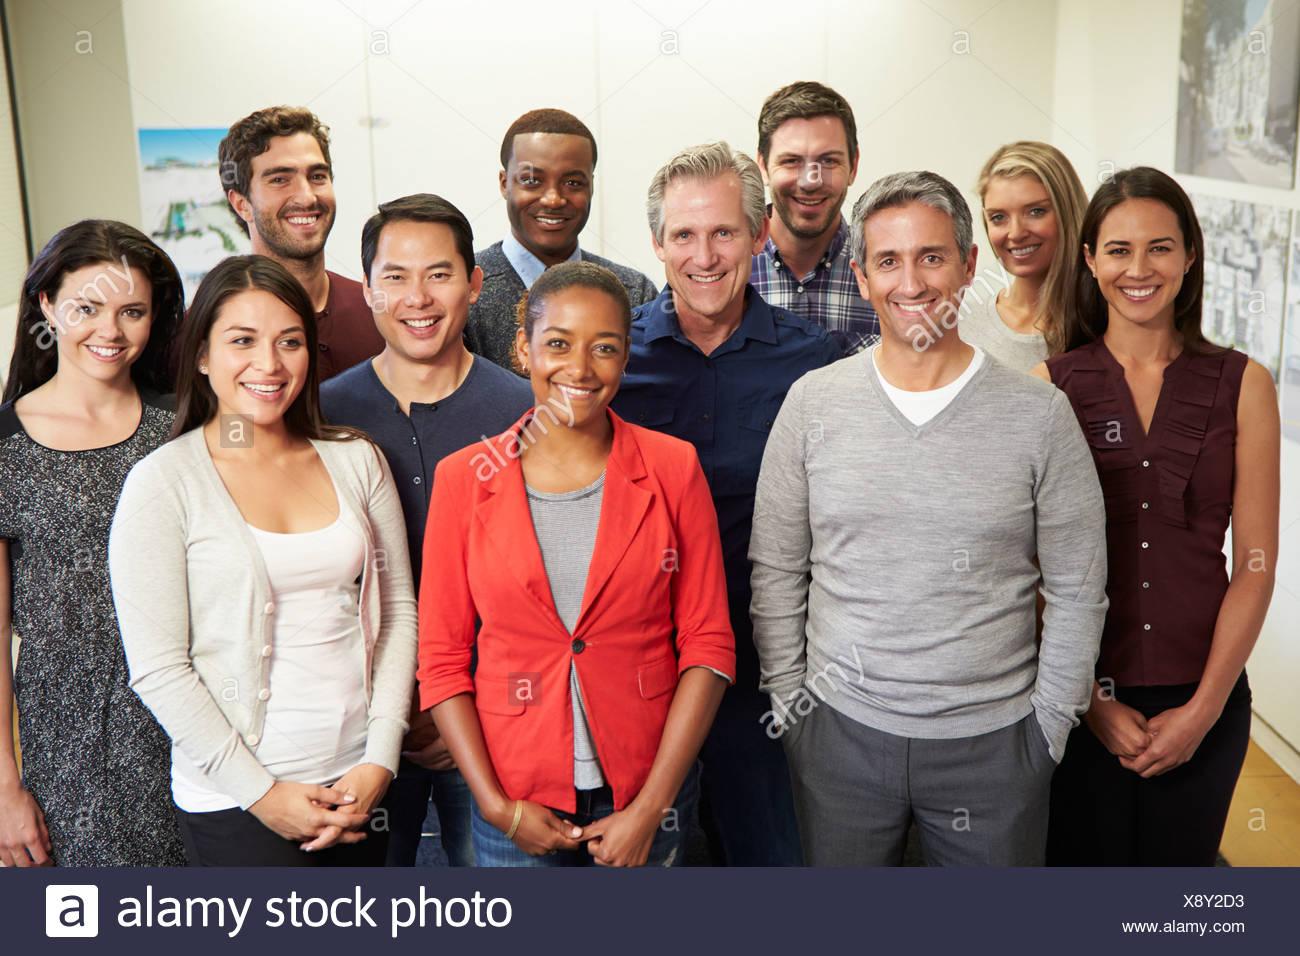 Portrait Of Staff In Modern Multi-Ethnic Office - Stock Image